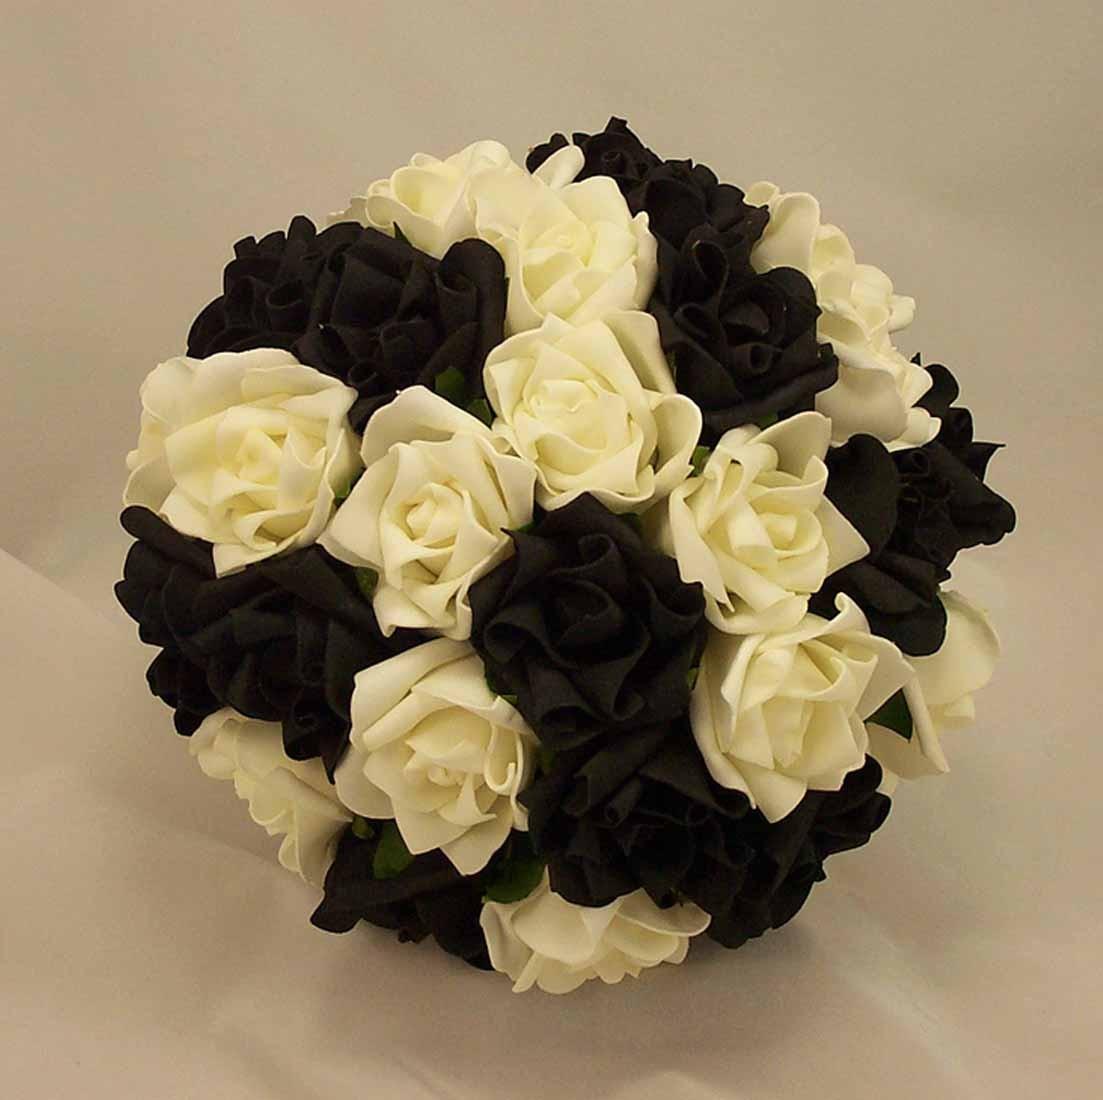 bridal bouquets black white rose bridal bouquet silk. Black Bedroom Furniture Sets. Home Design Ideas